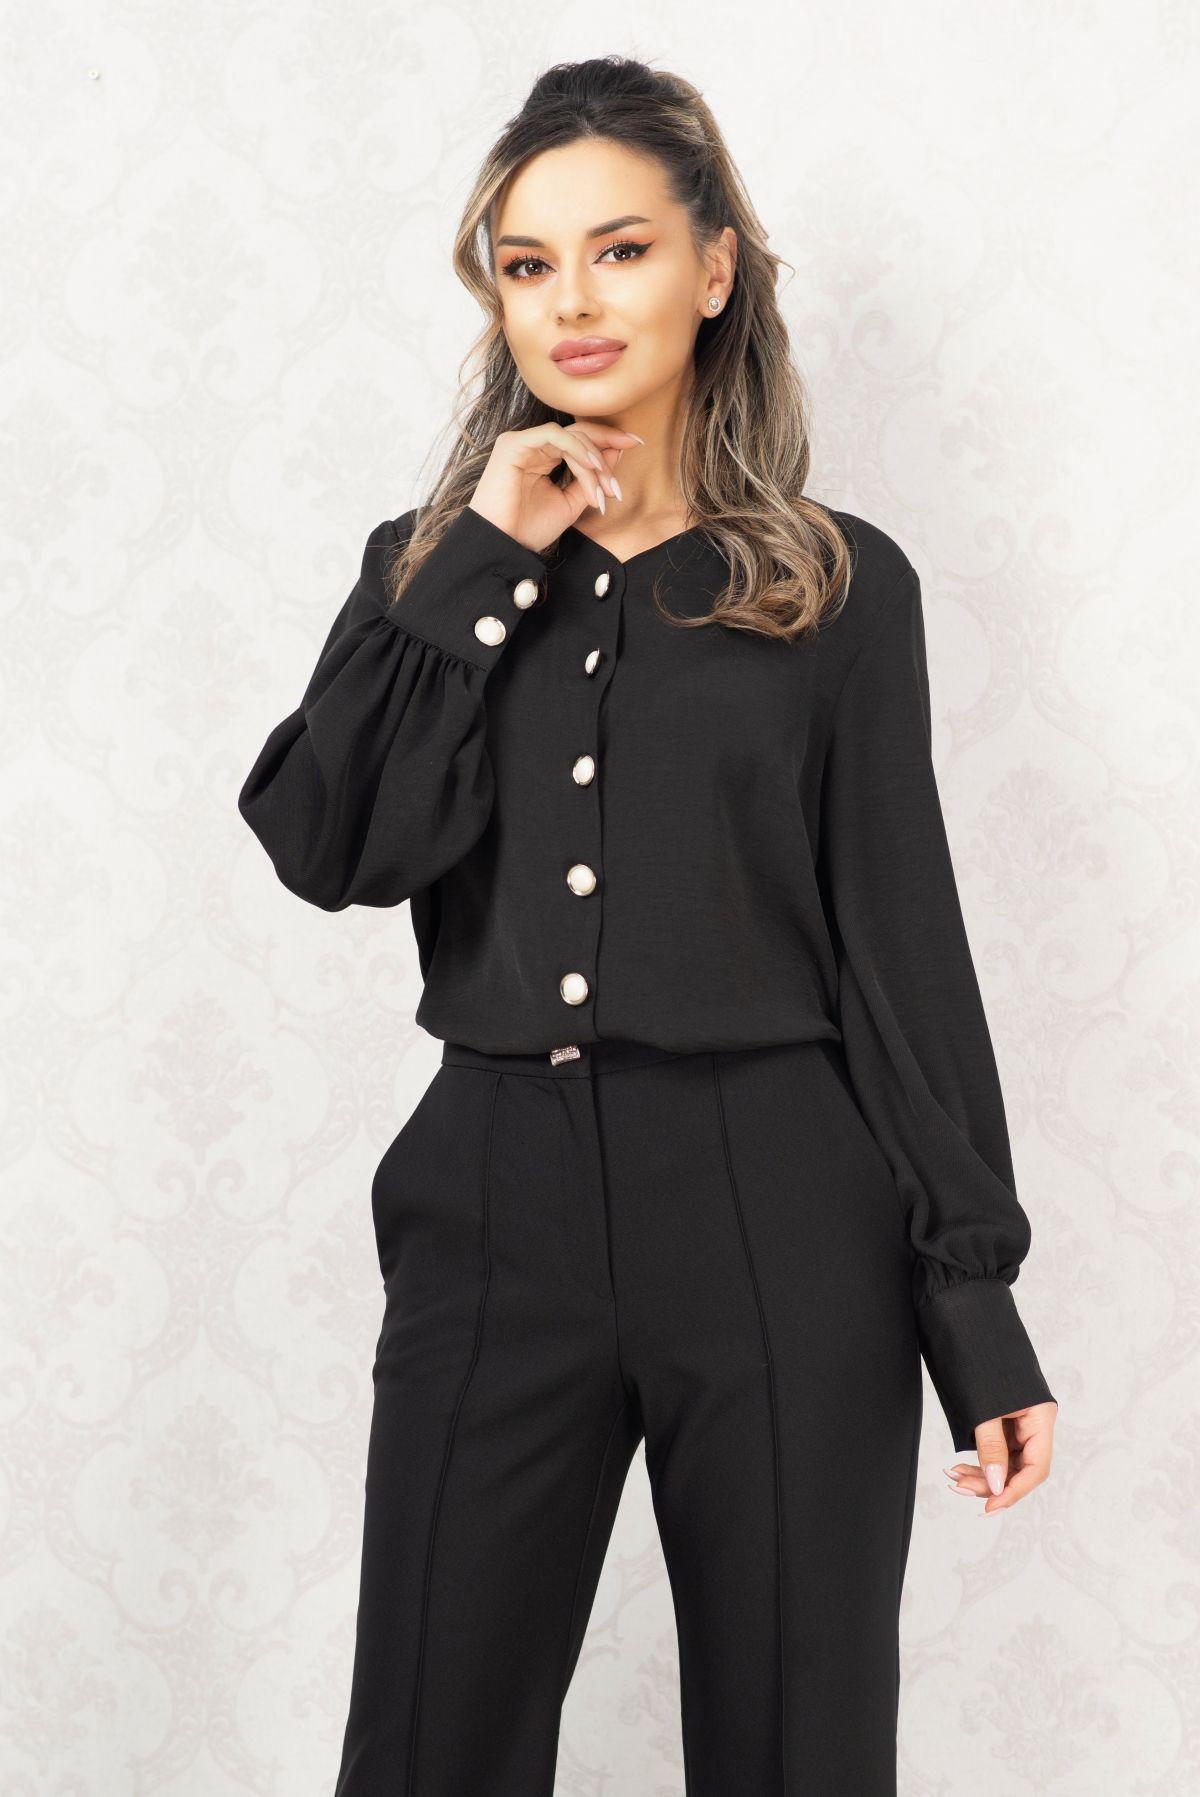 Camasa eleganta neagra cu nasturi maxi si mansete late